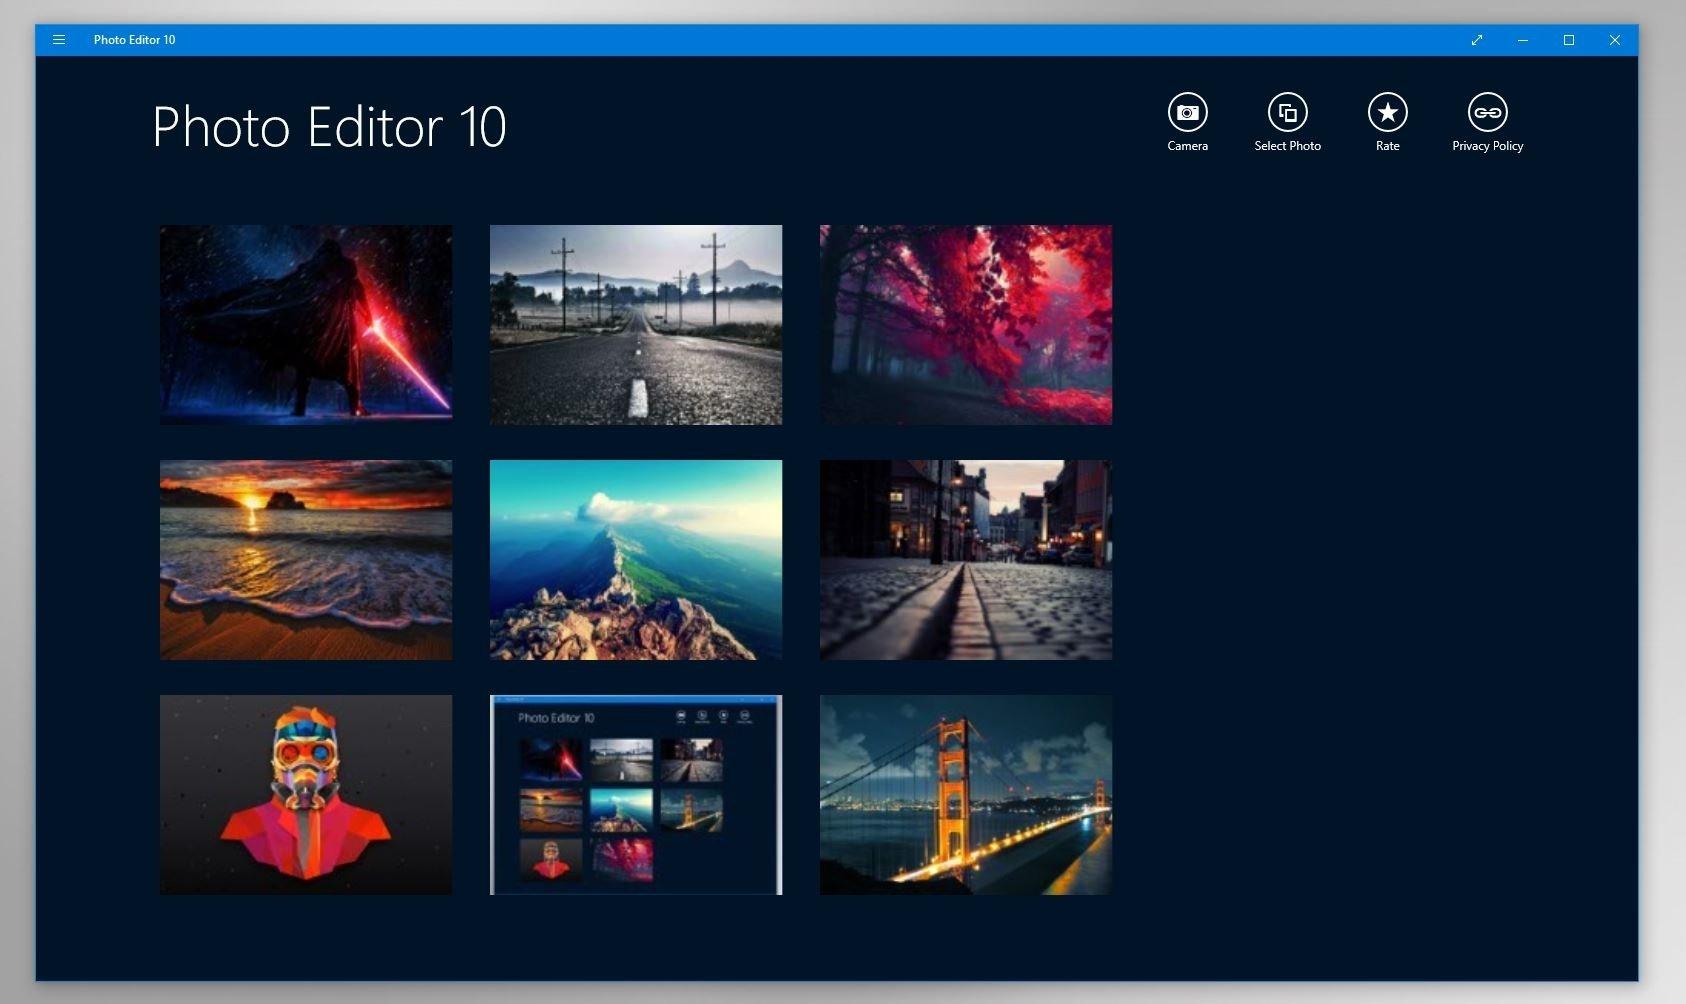 pc web camera software free download windows 10